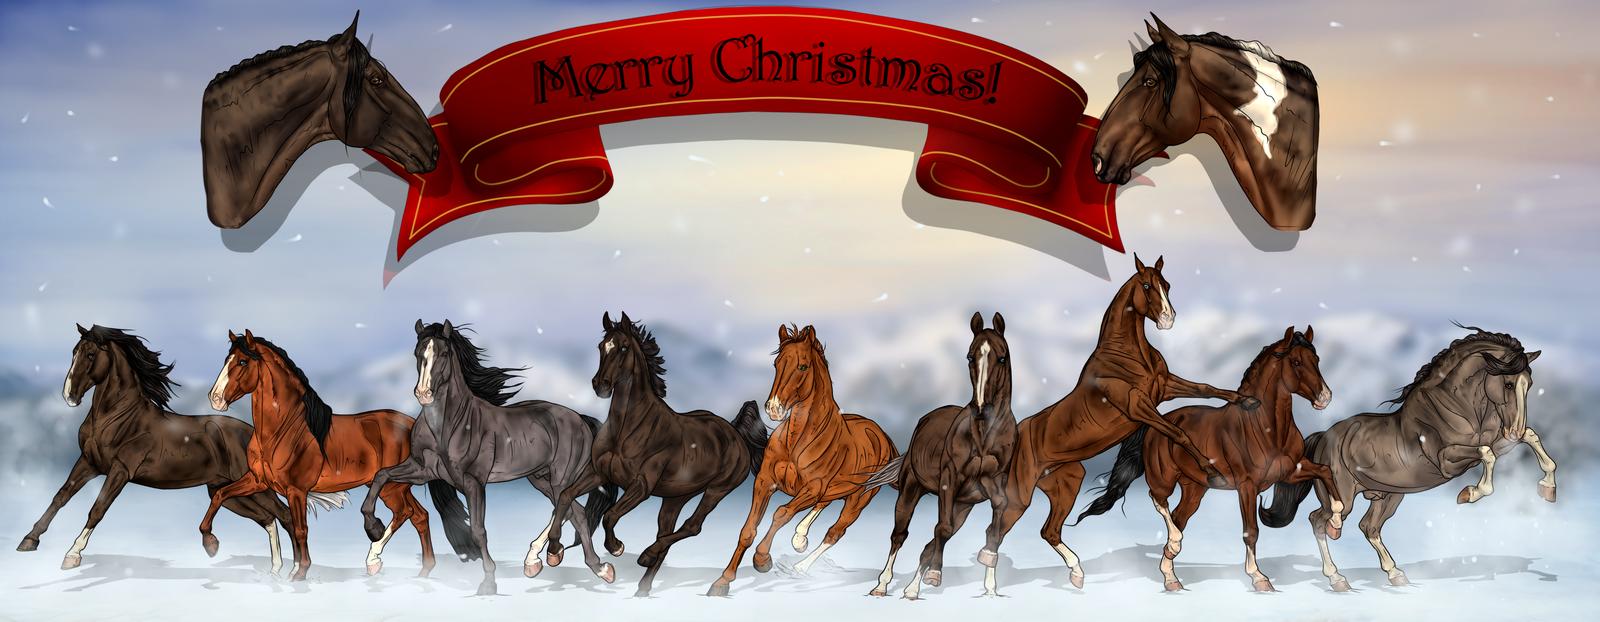 ~ Merry Christmas ~ by CalyArt